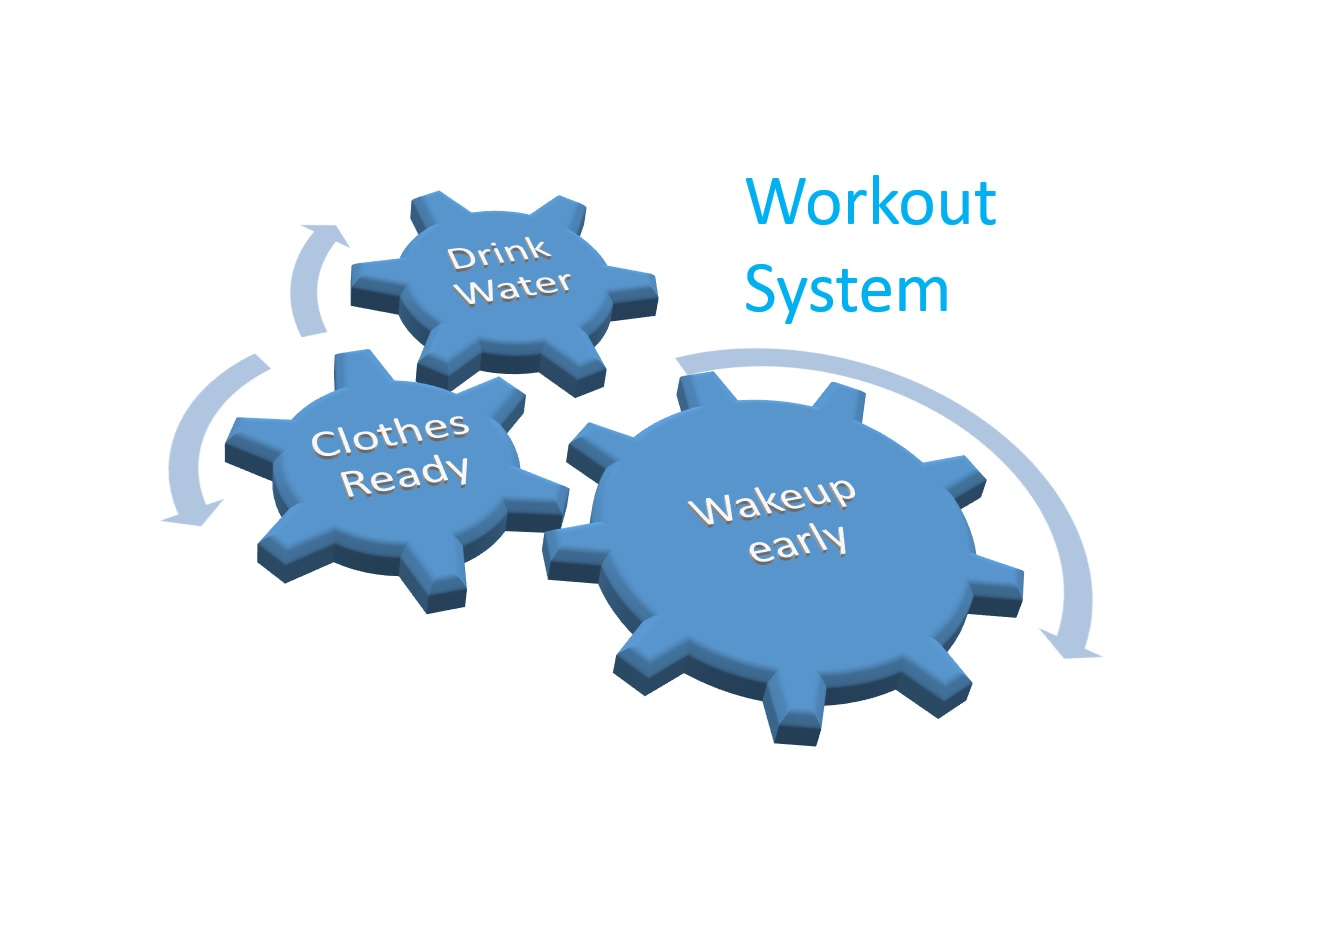 WorkoutSystem